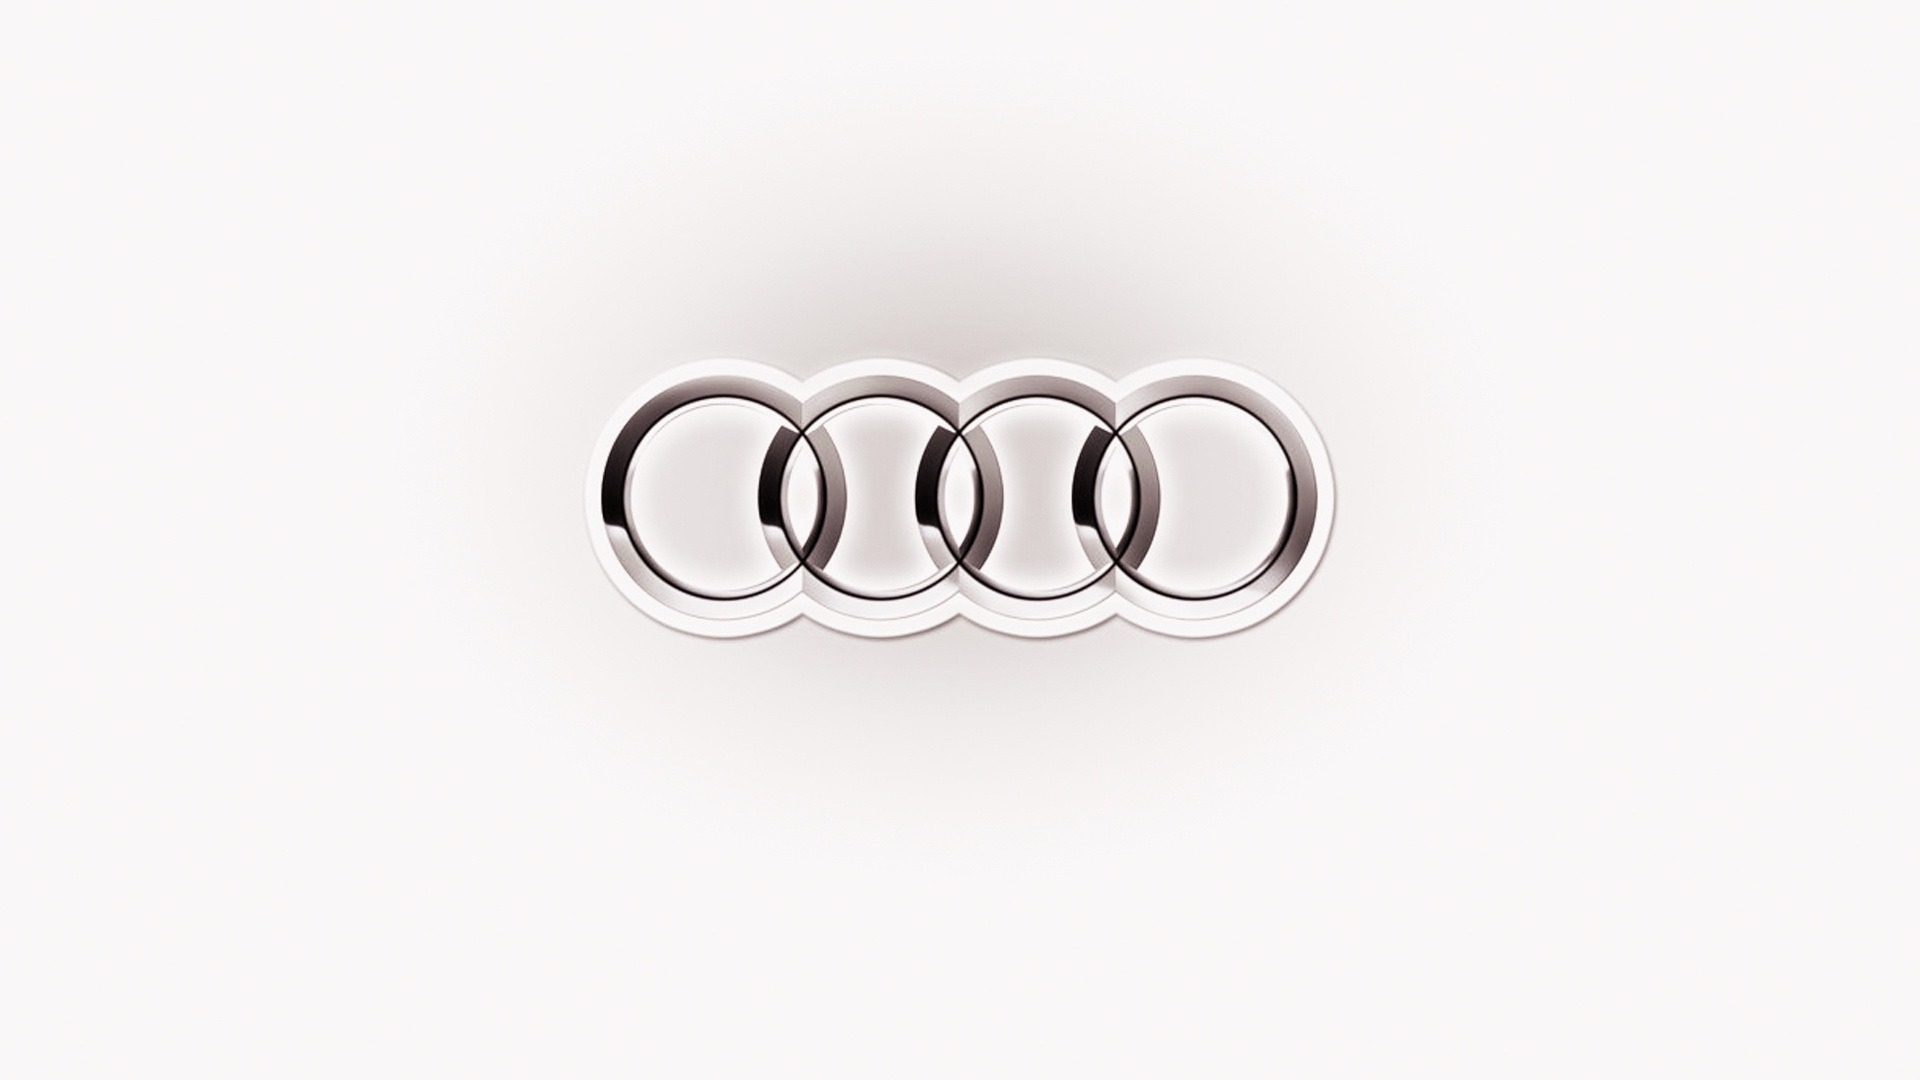 white audi logo wallpaper 58770